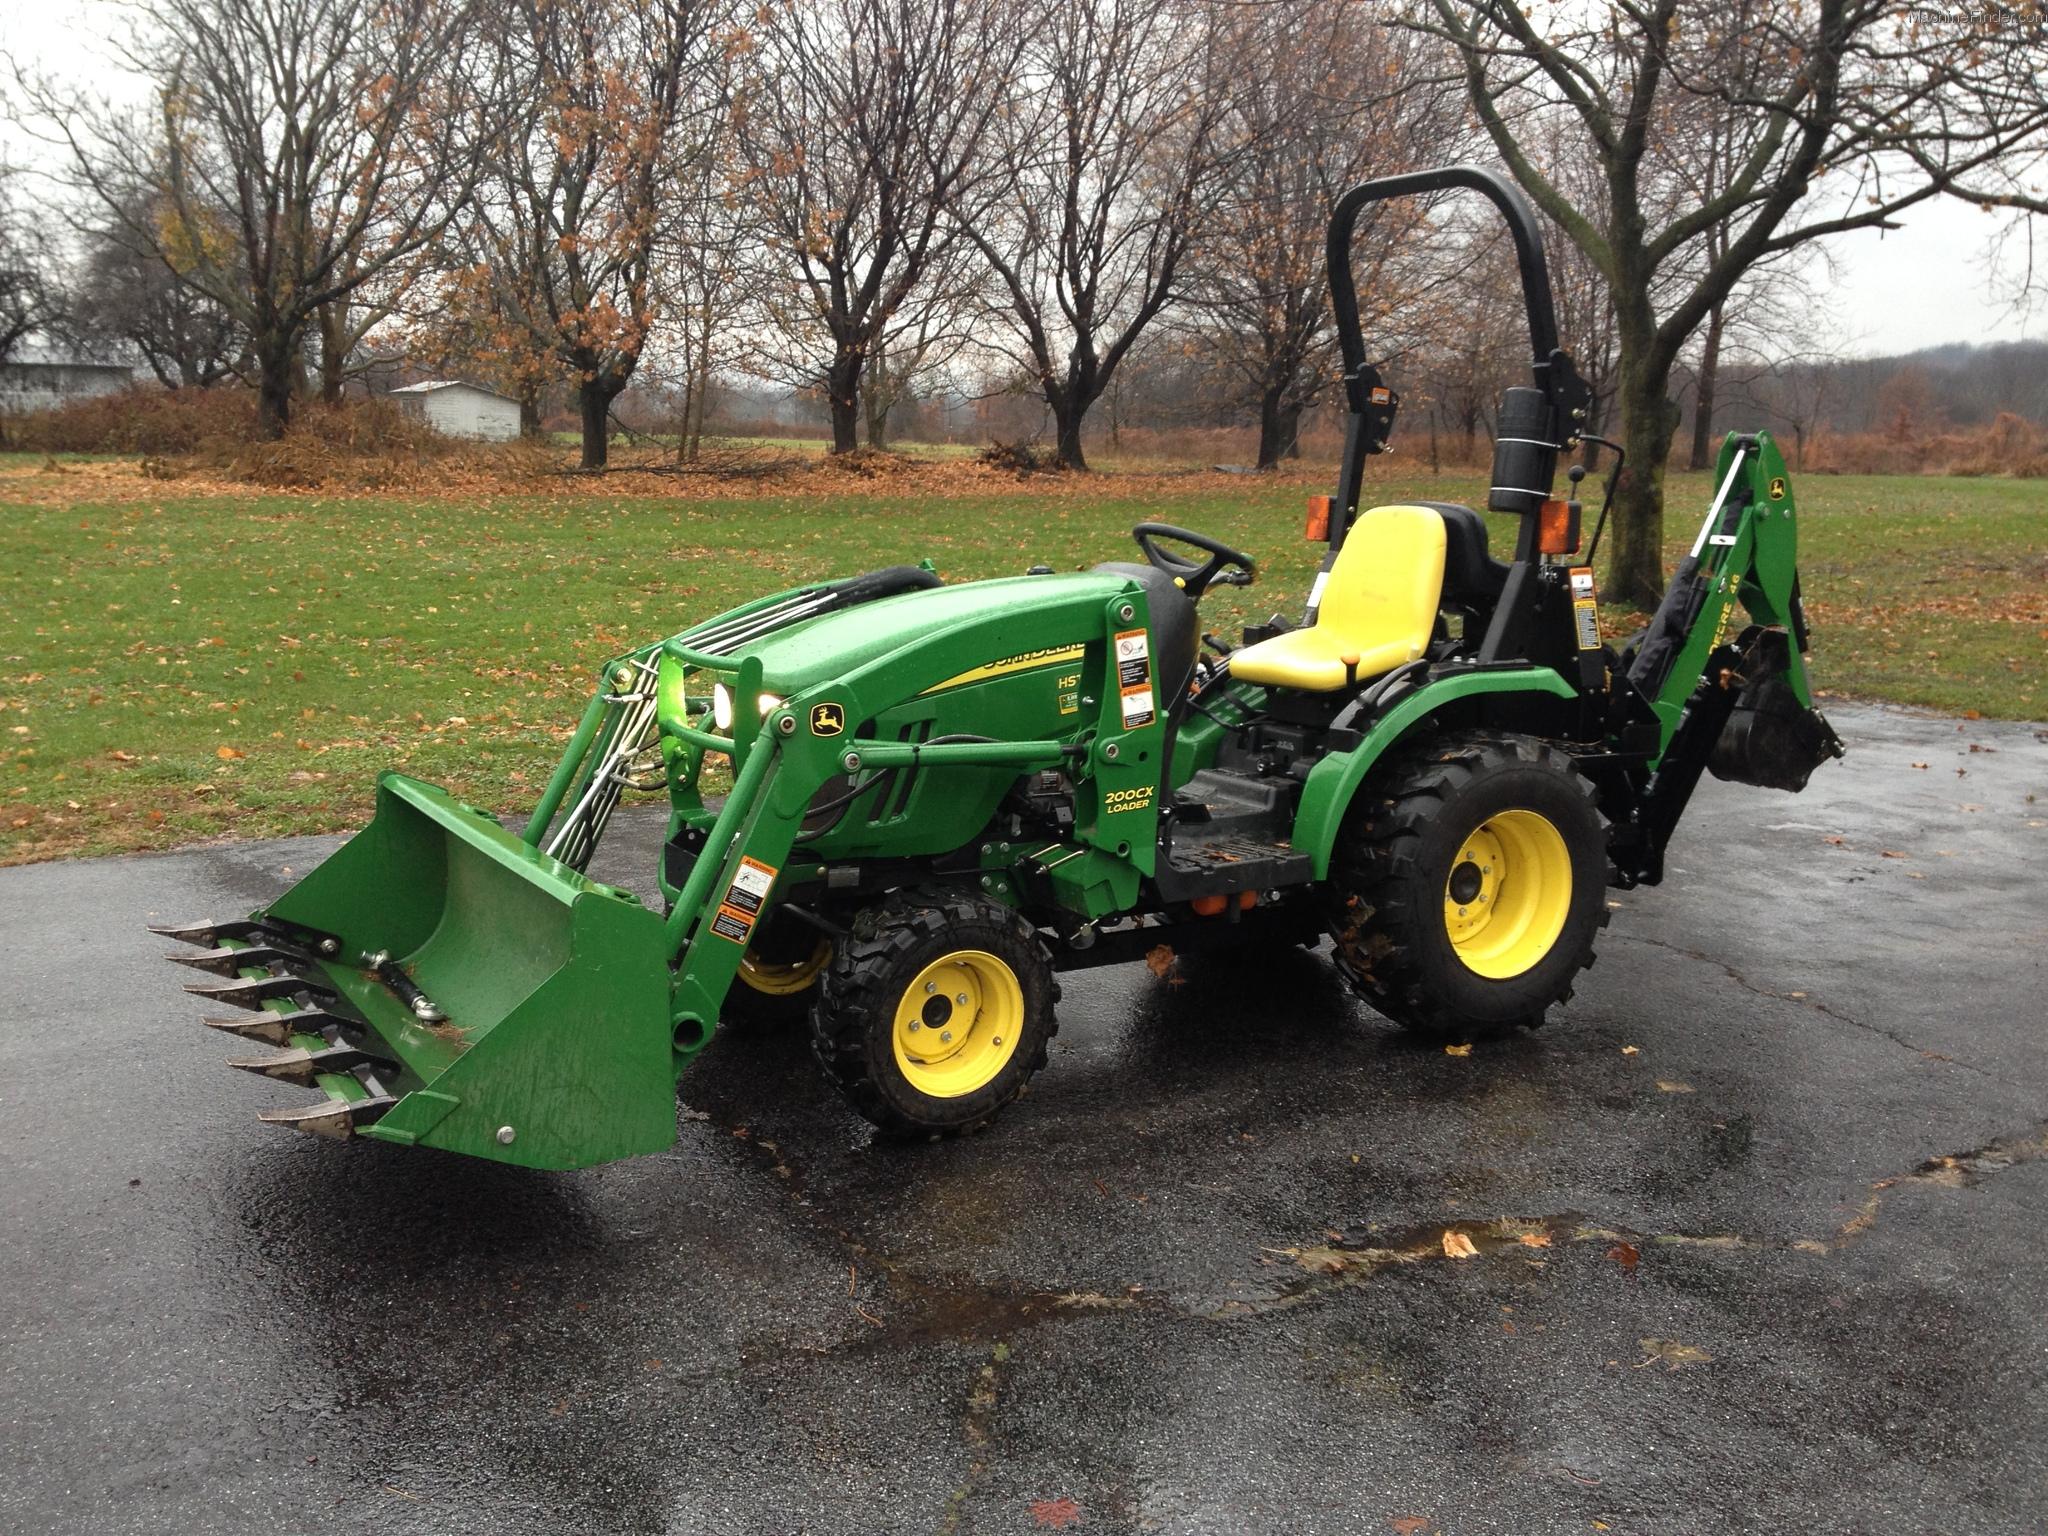 2011 John Deere 2320 Tractors - Compact (1-40hp.) - John ...